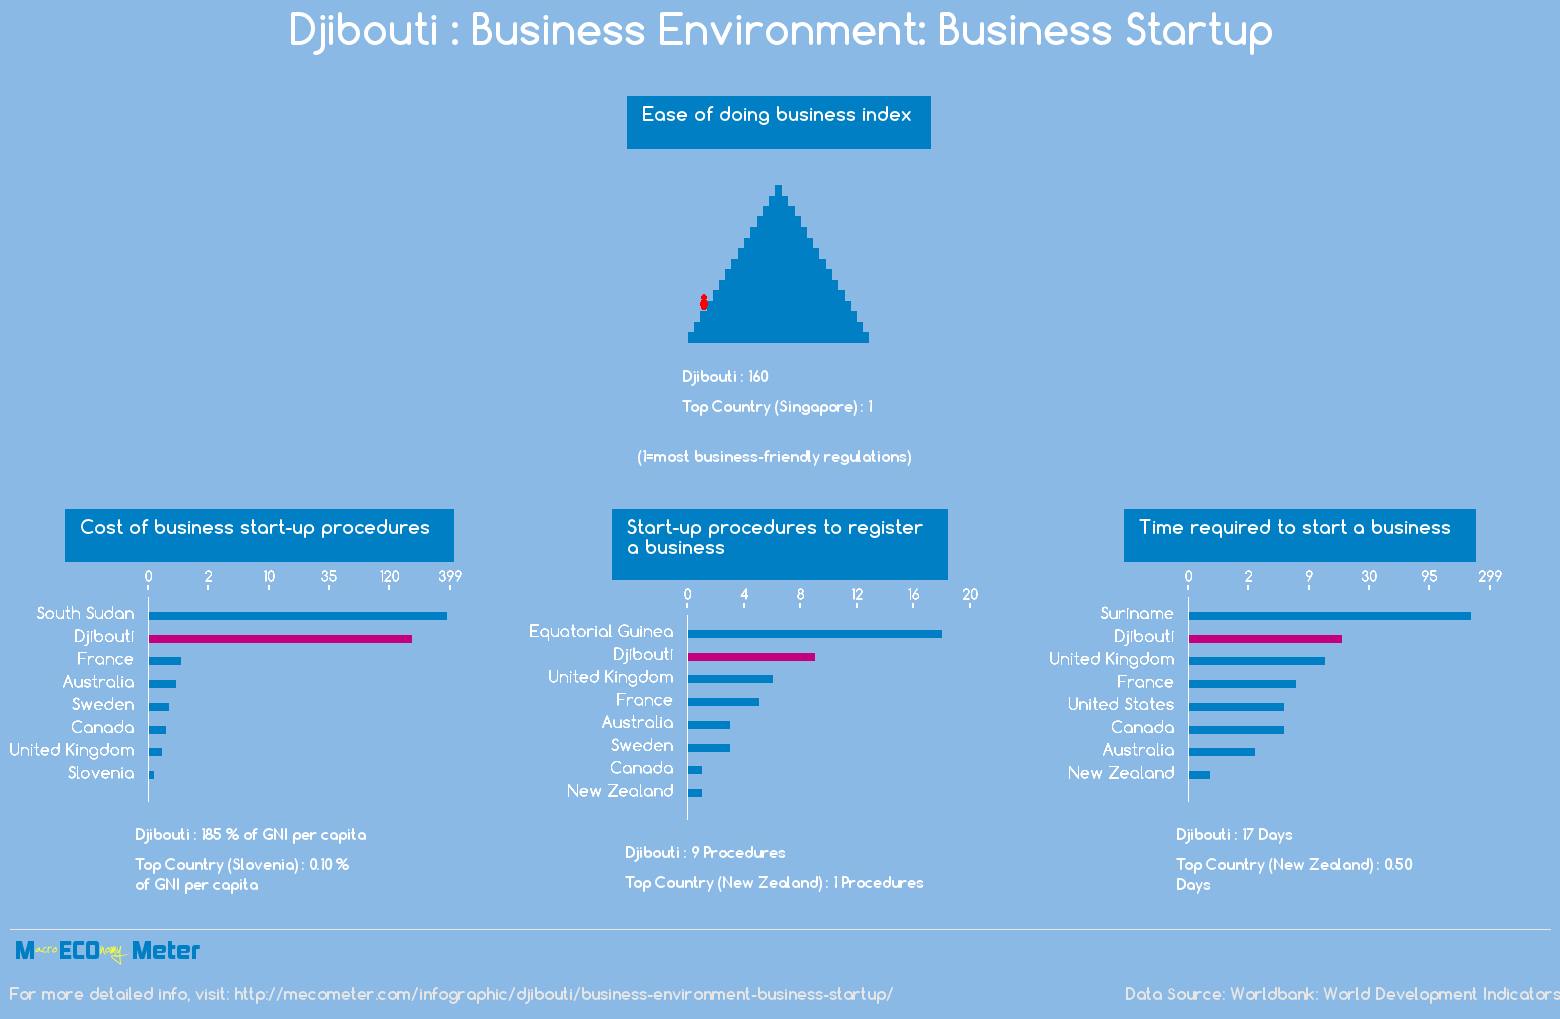 Djibouti : Business Environment: Business Startup